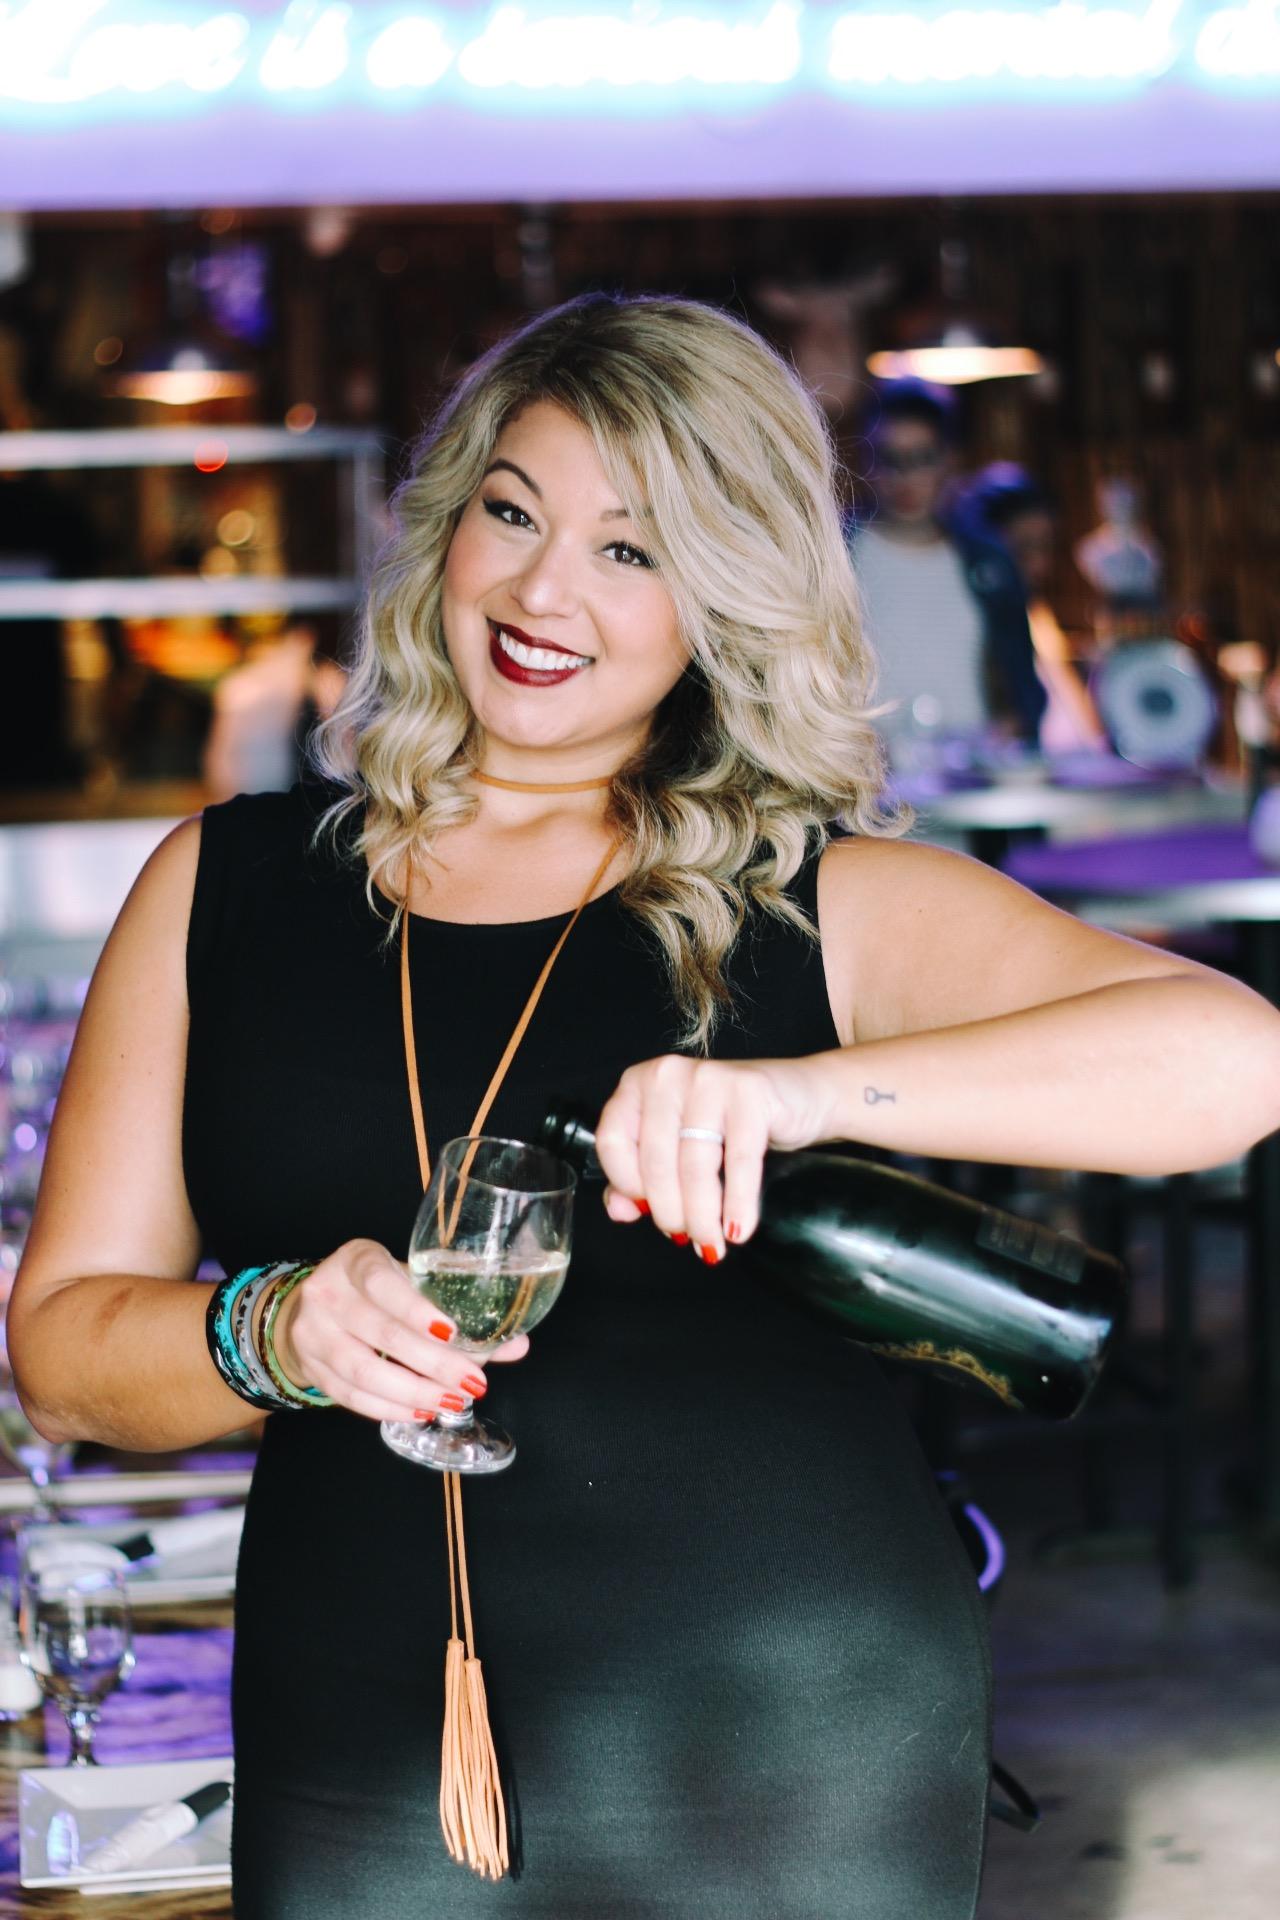 Women Who Wine-Uncorked Conversations-Eat Greek-Miami Wine Events-Wine Tasting Miami-6.jpg